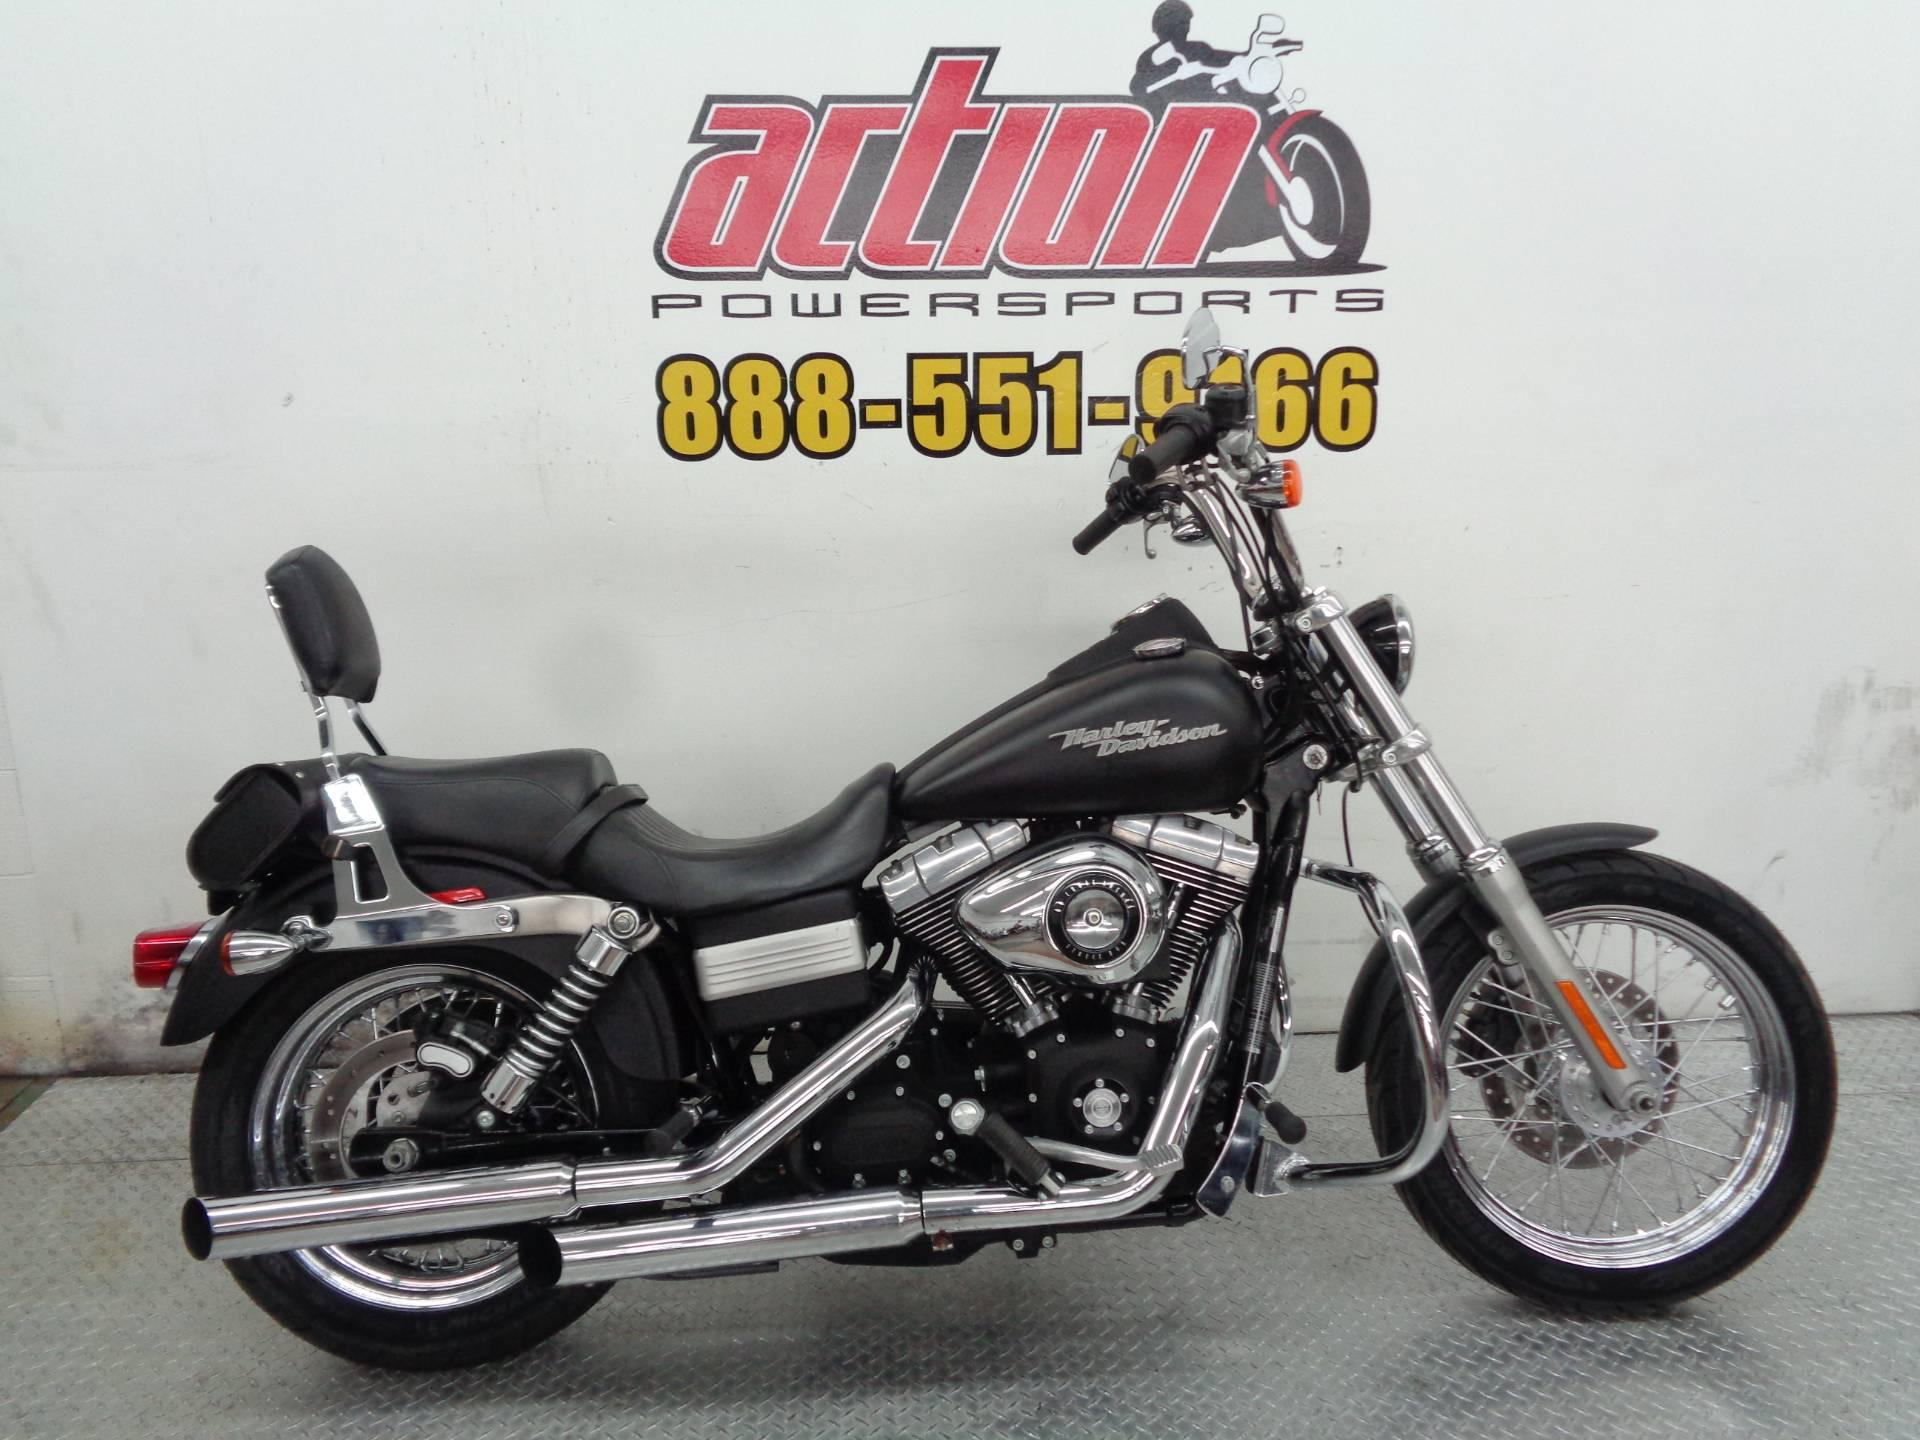 Used 2008 Harley-Davidson Dyna® Street Bob® Motorcycles in Tulsa, OK ...